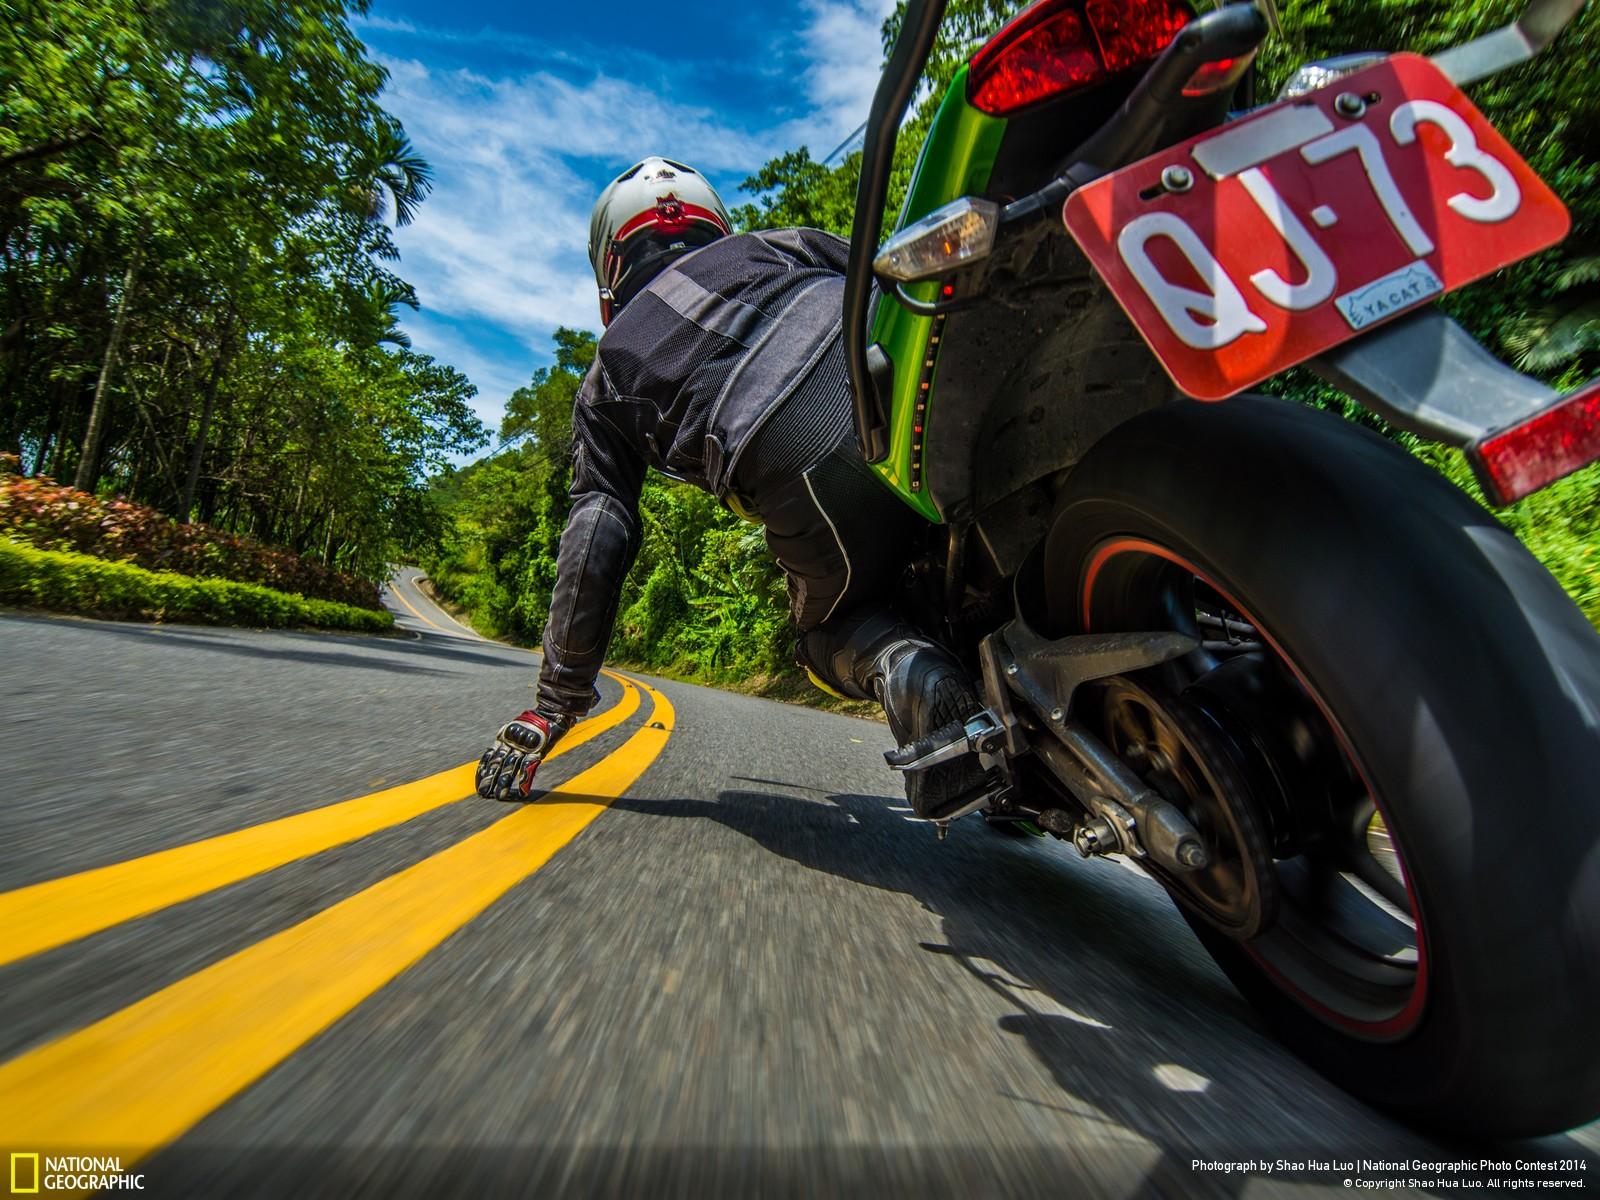 taiwanease.com • Beautiful photograph of Taiwan motorcyclist